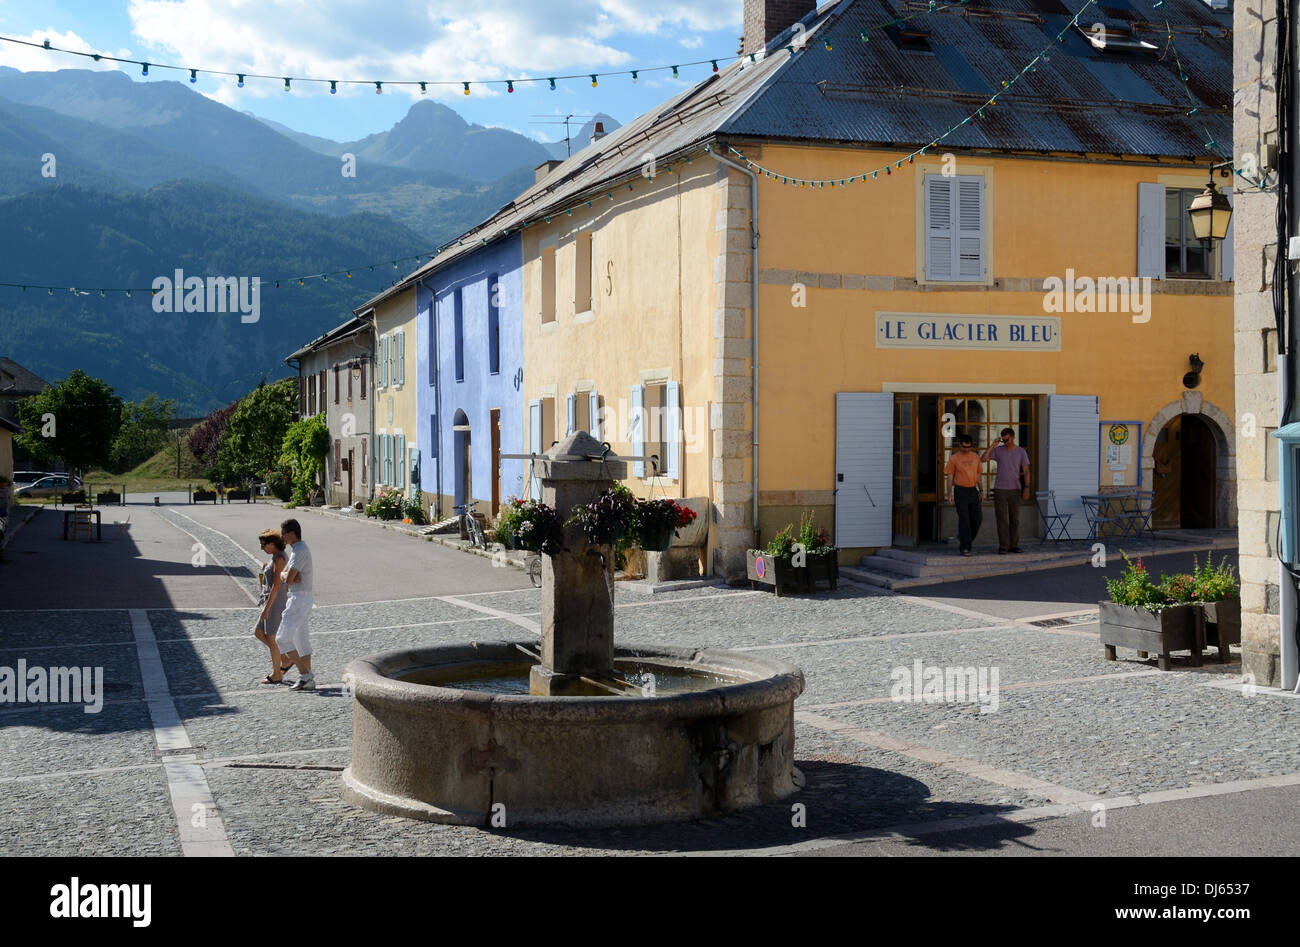 Tourists Walk Along the Main Street Mont-Dauphin Hautes-Alpes France - Stock Image